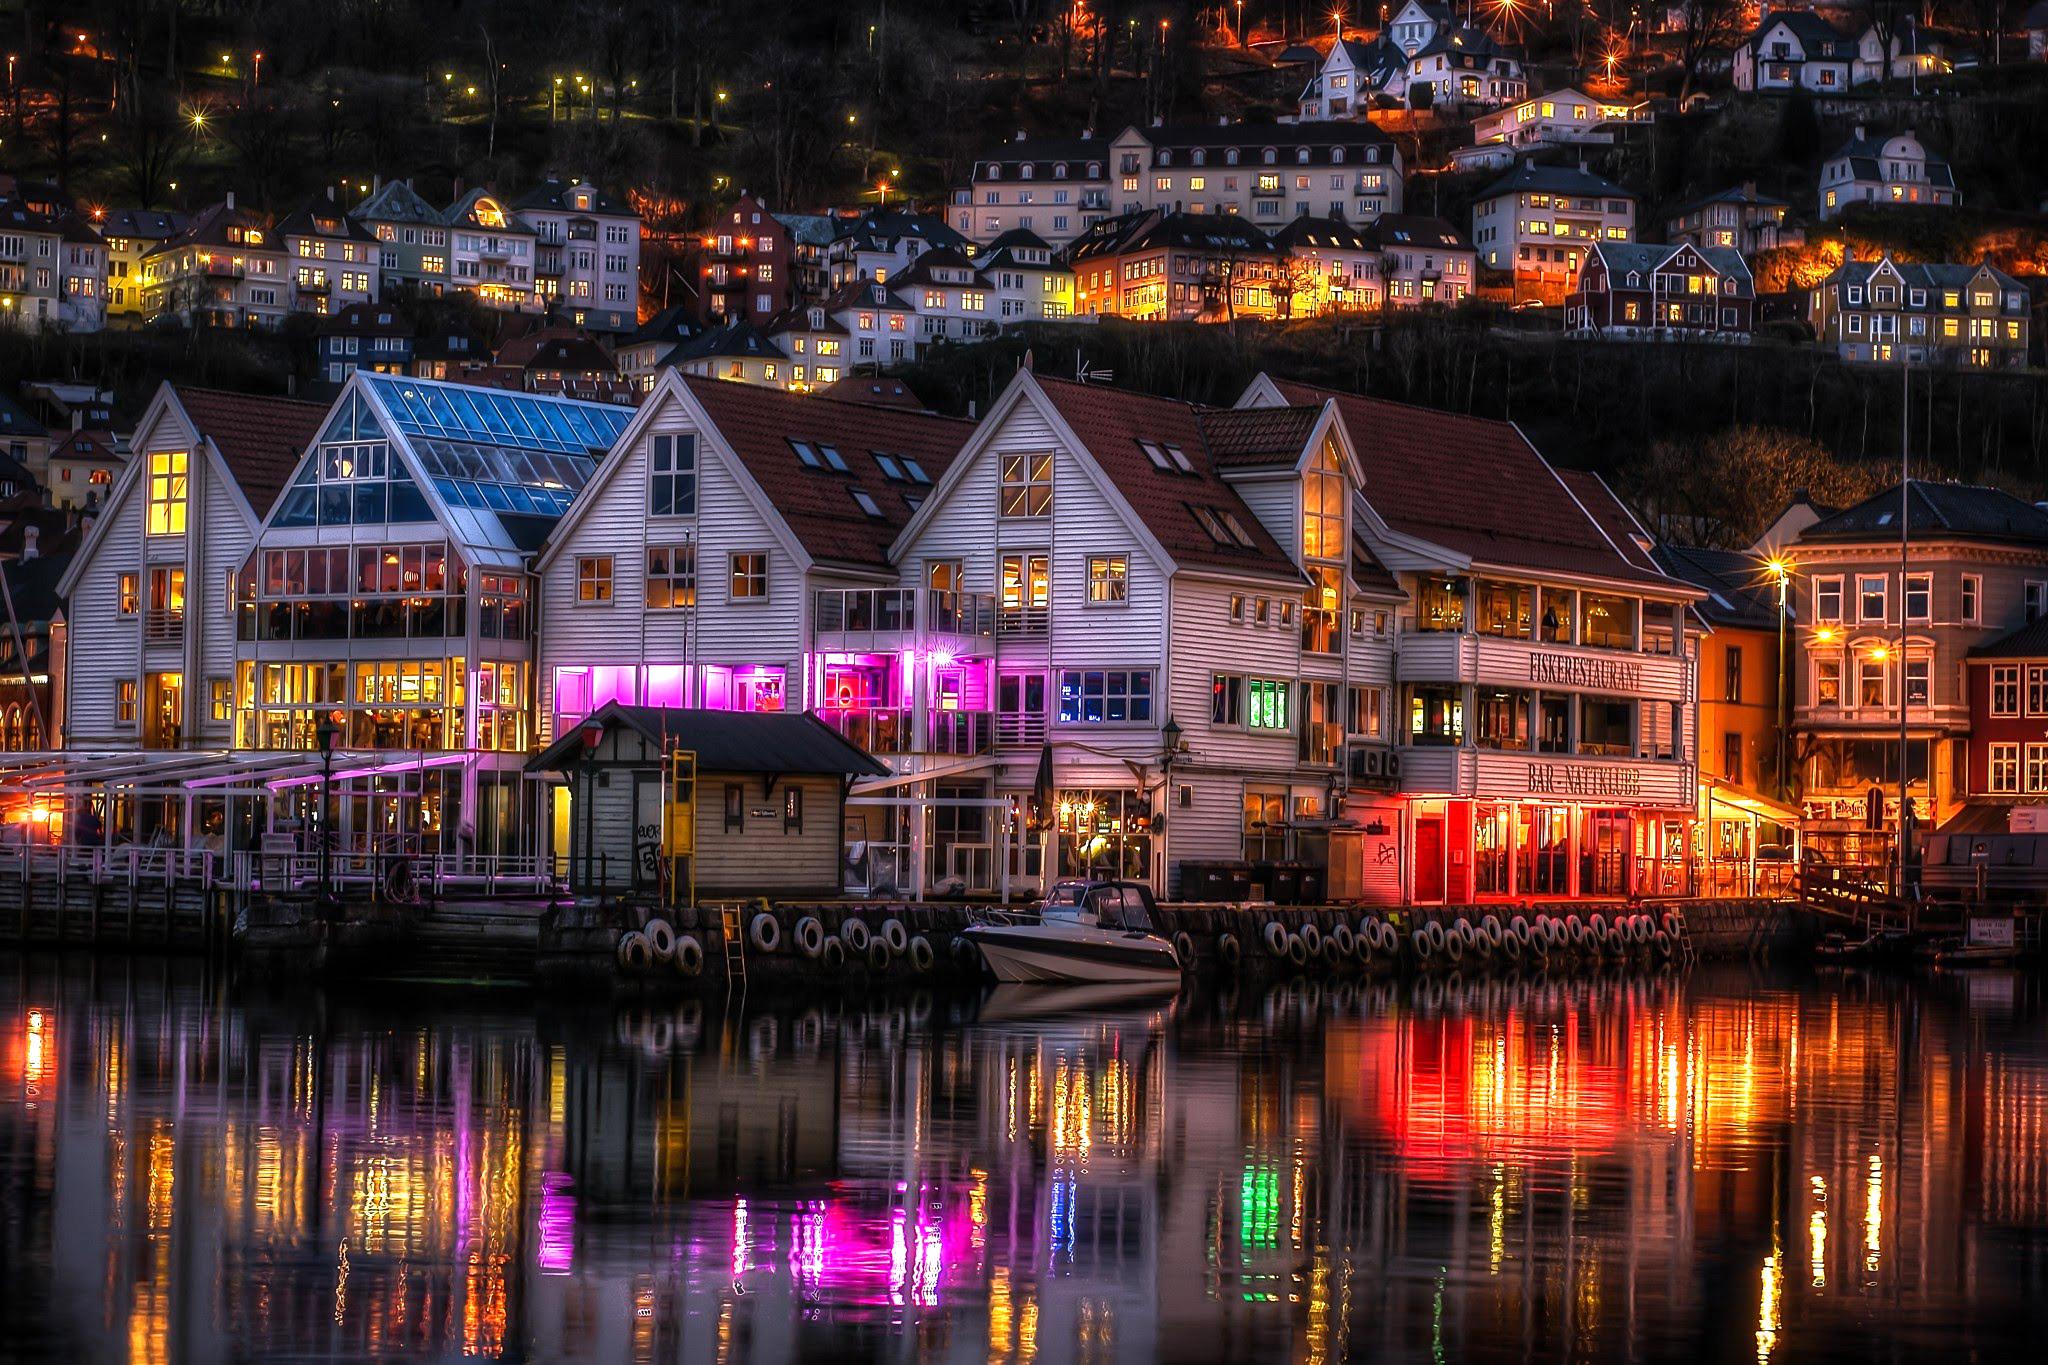 Ночной Берген, Норвегия